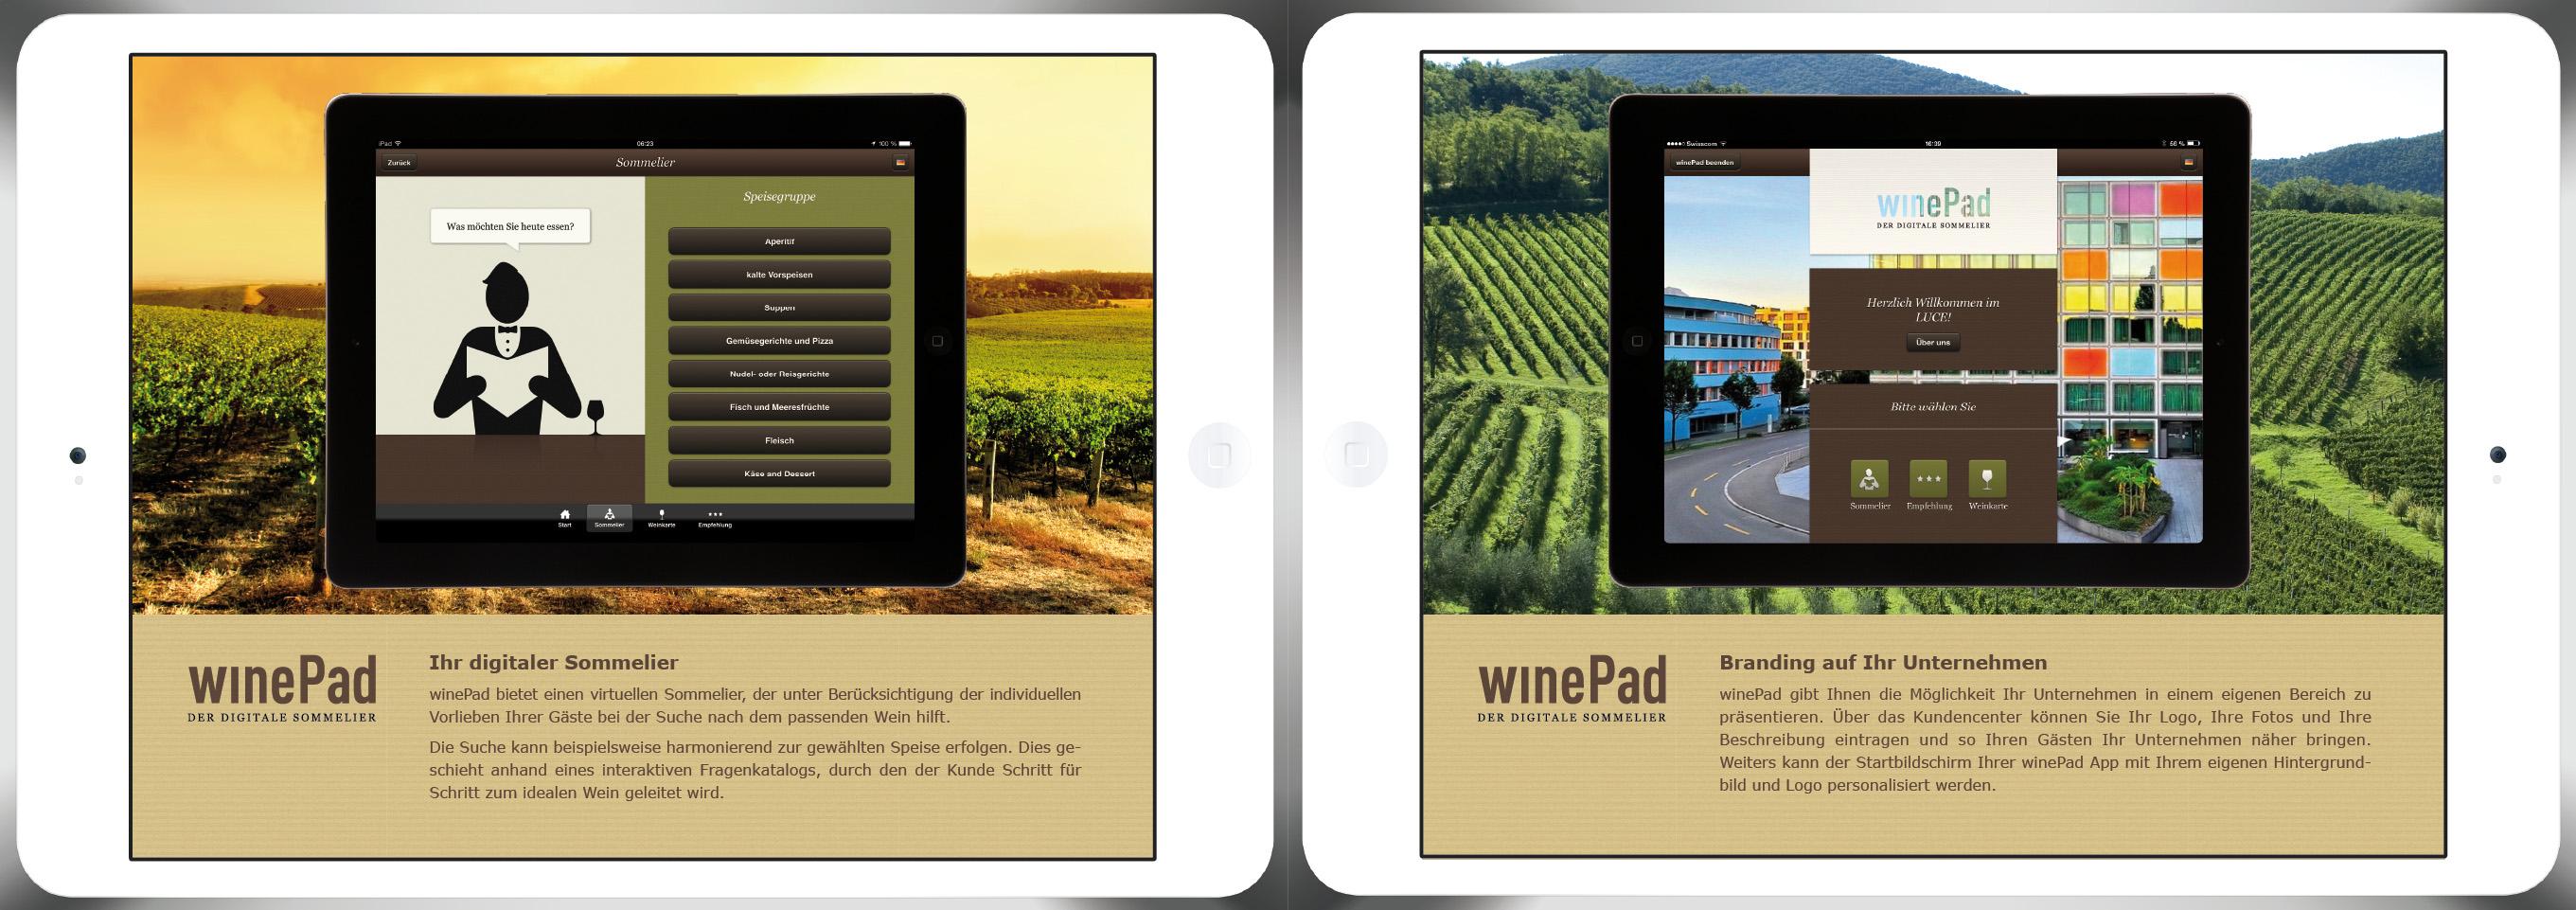 WinePad_iPad-Broschuere_Inhalt